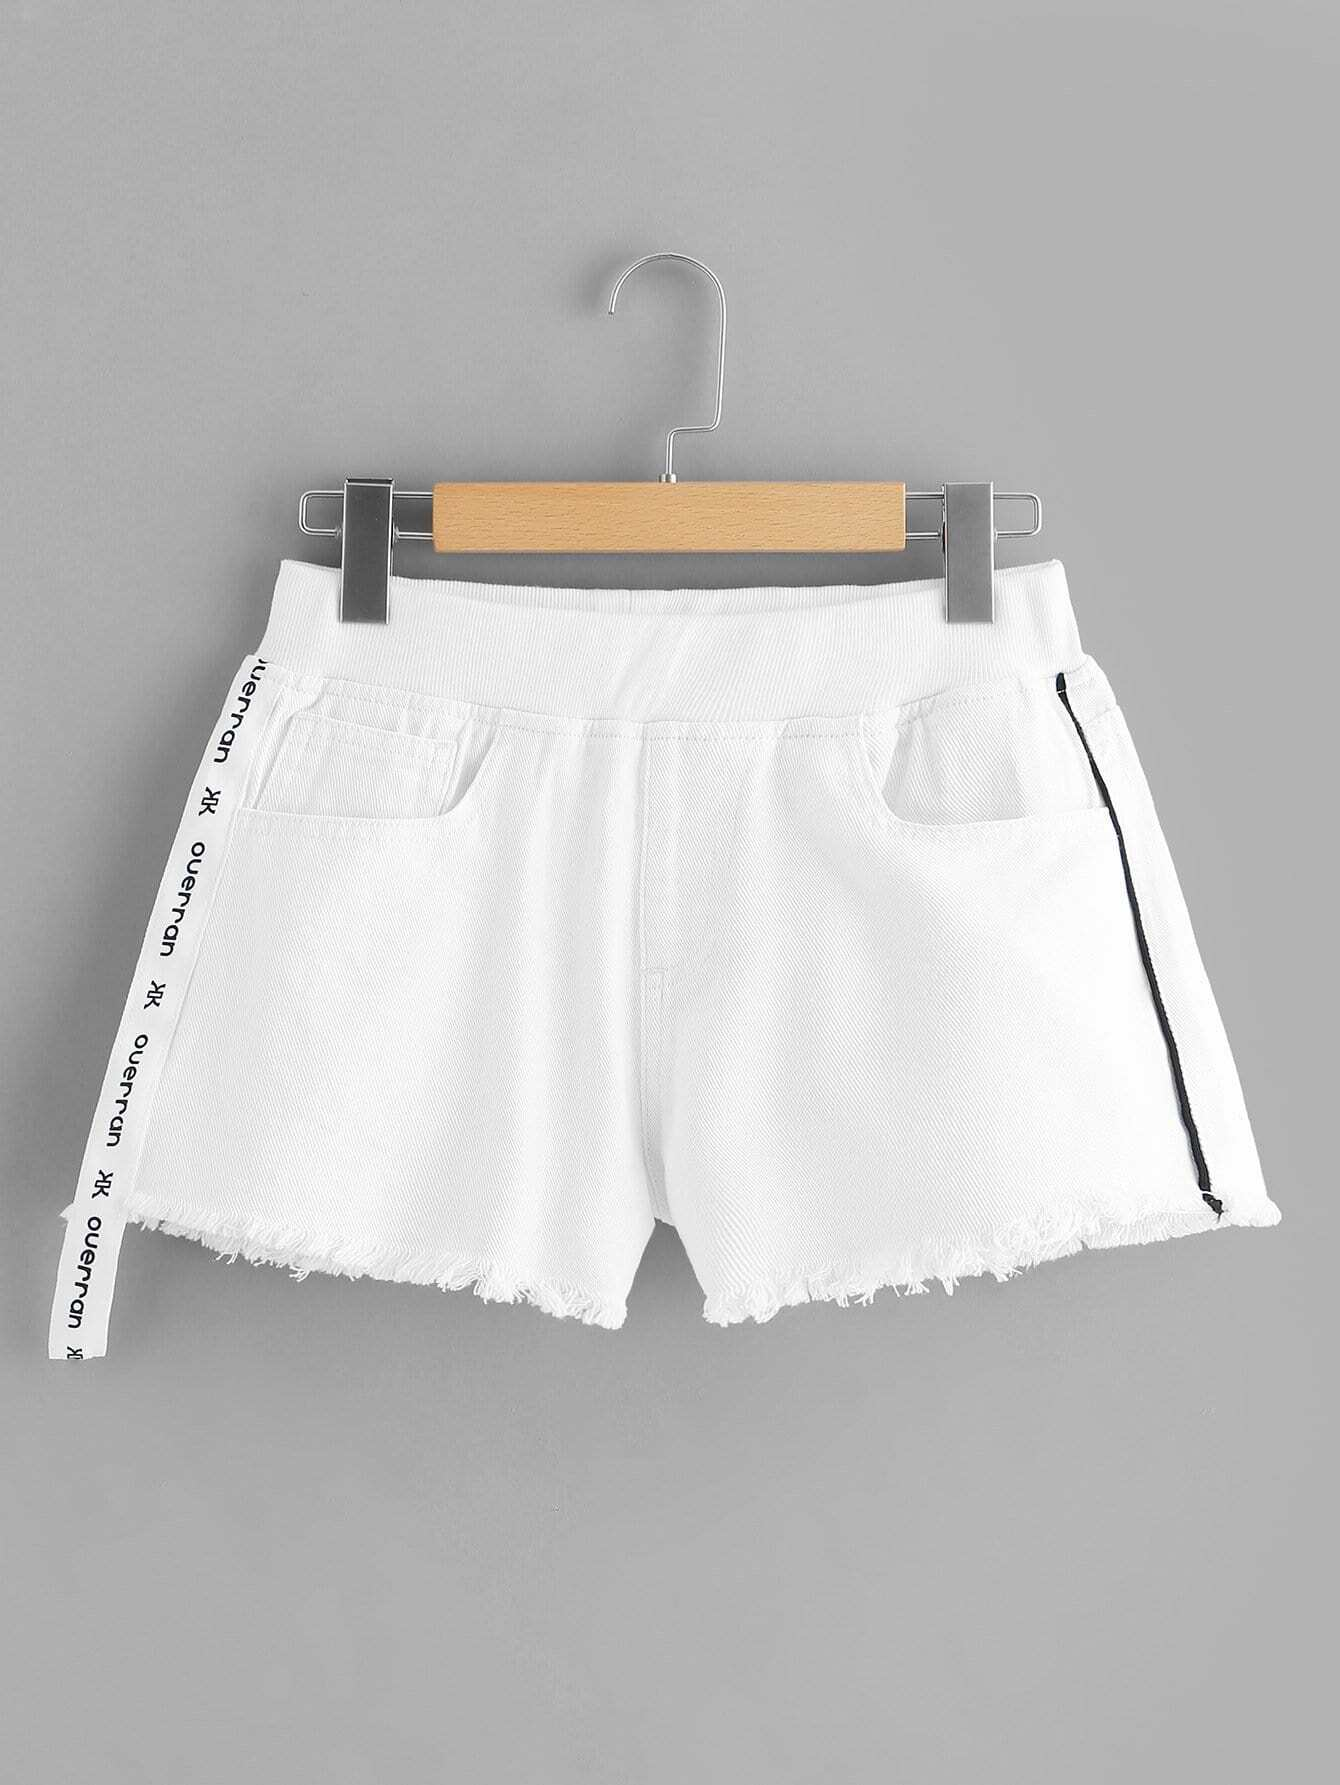 Купить Контрастность Letter Tape Side Raw Hem Denim Shorts, null, SheIn